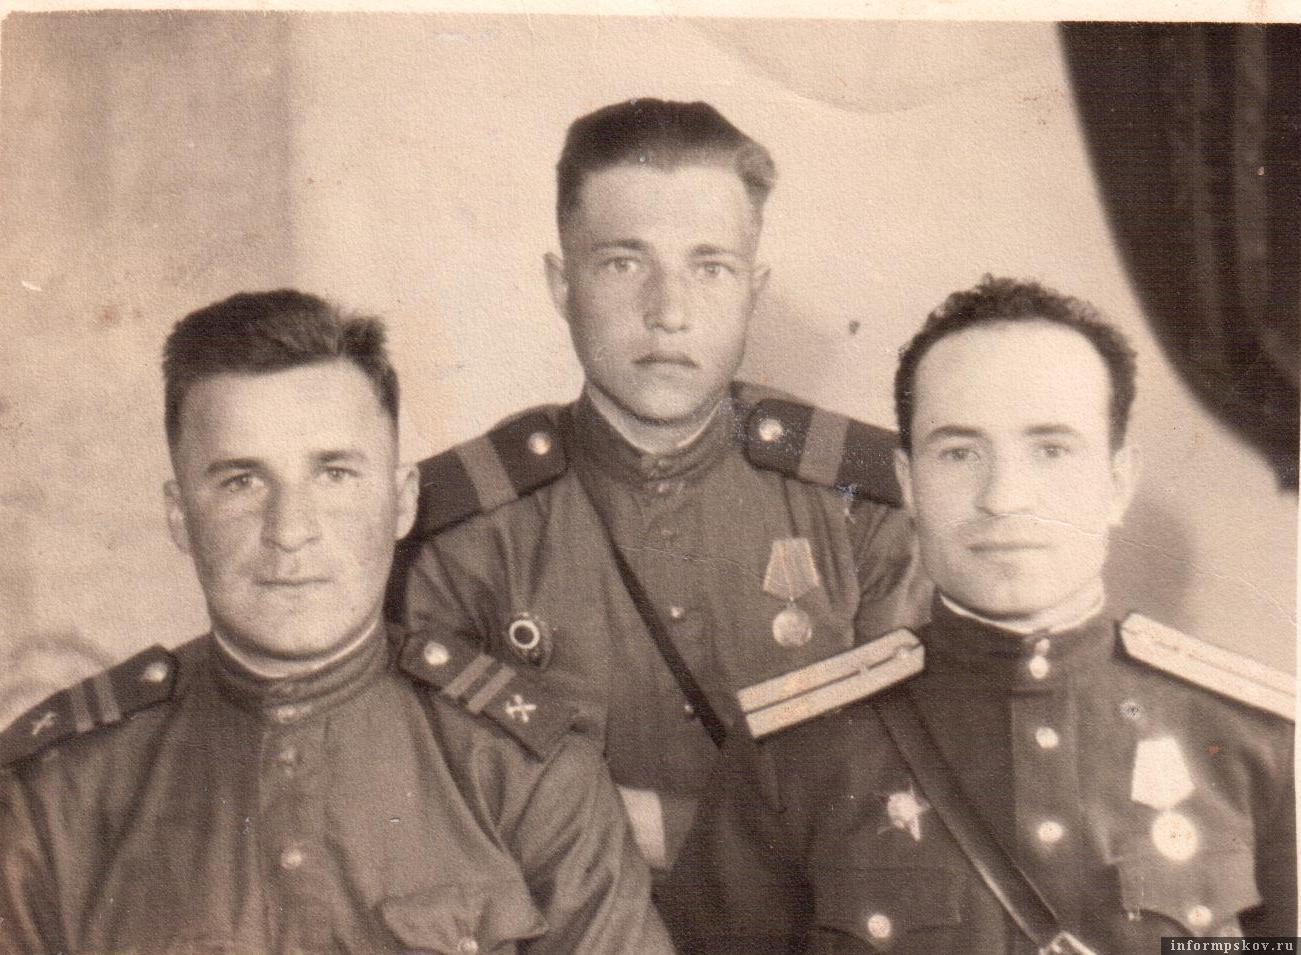 21.04.1945. Слева направо: Д. Байчаров, А. Сипов, М. Белоус